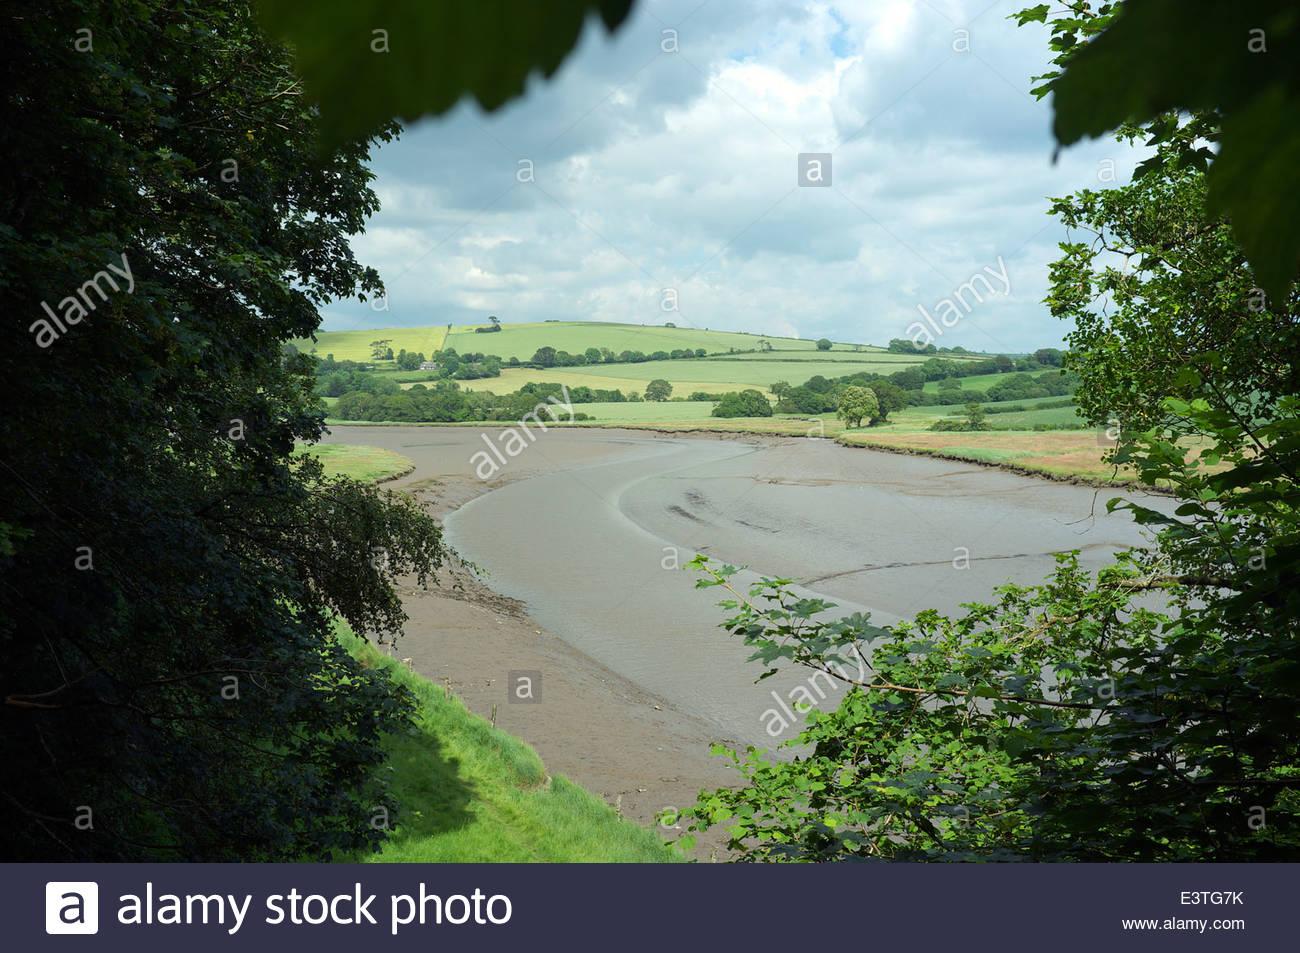 Die tidal River Tiddy am St.Germans in Cornwall, Großbritannien. Stockbild